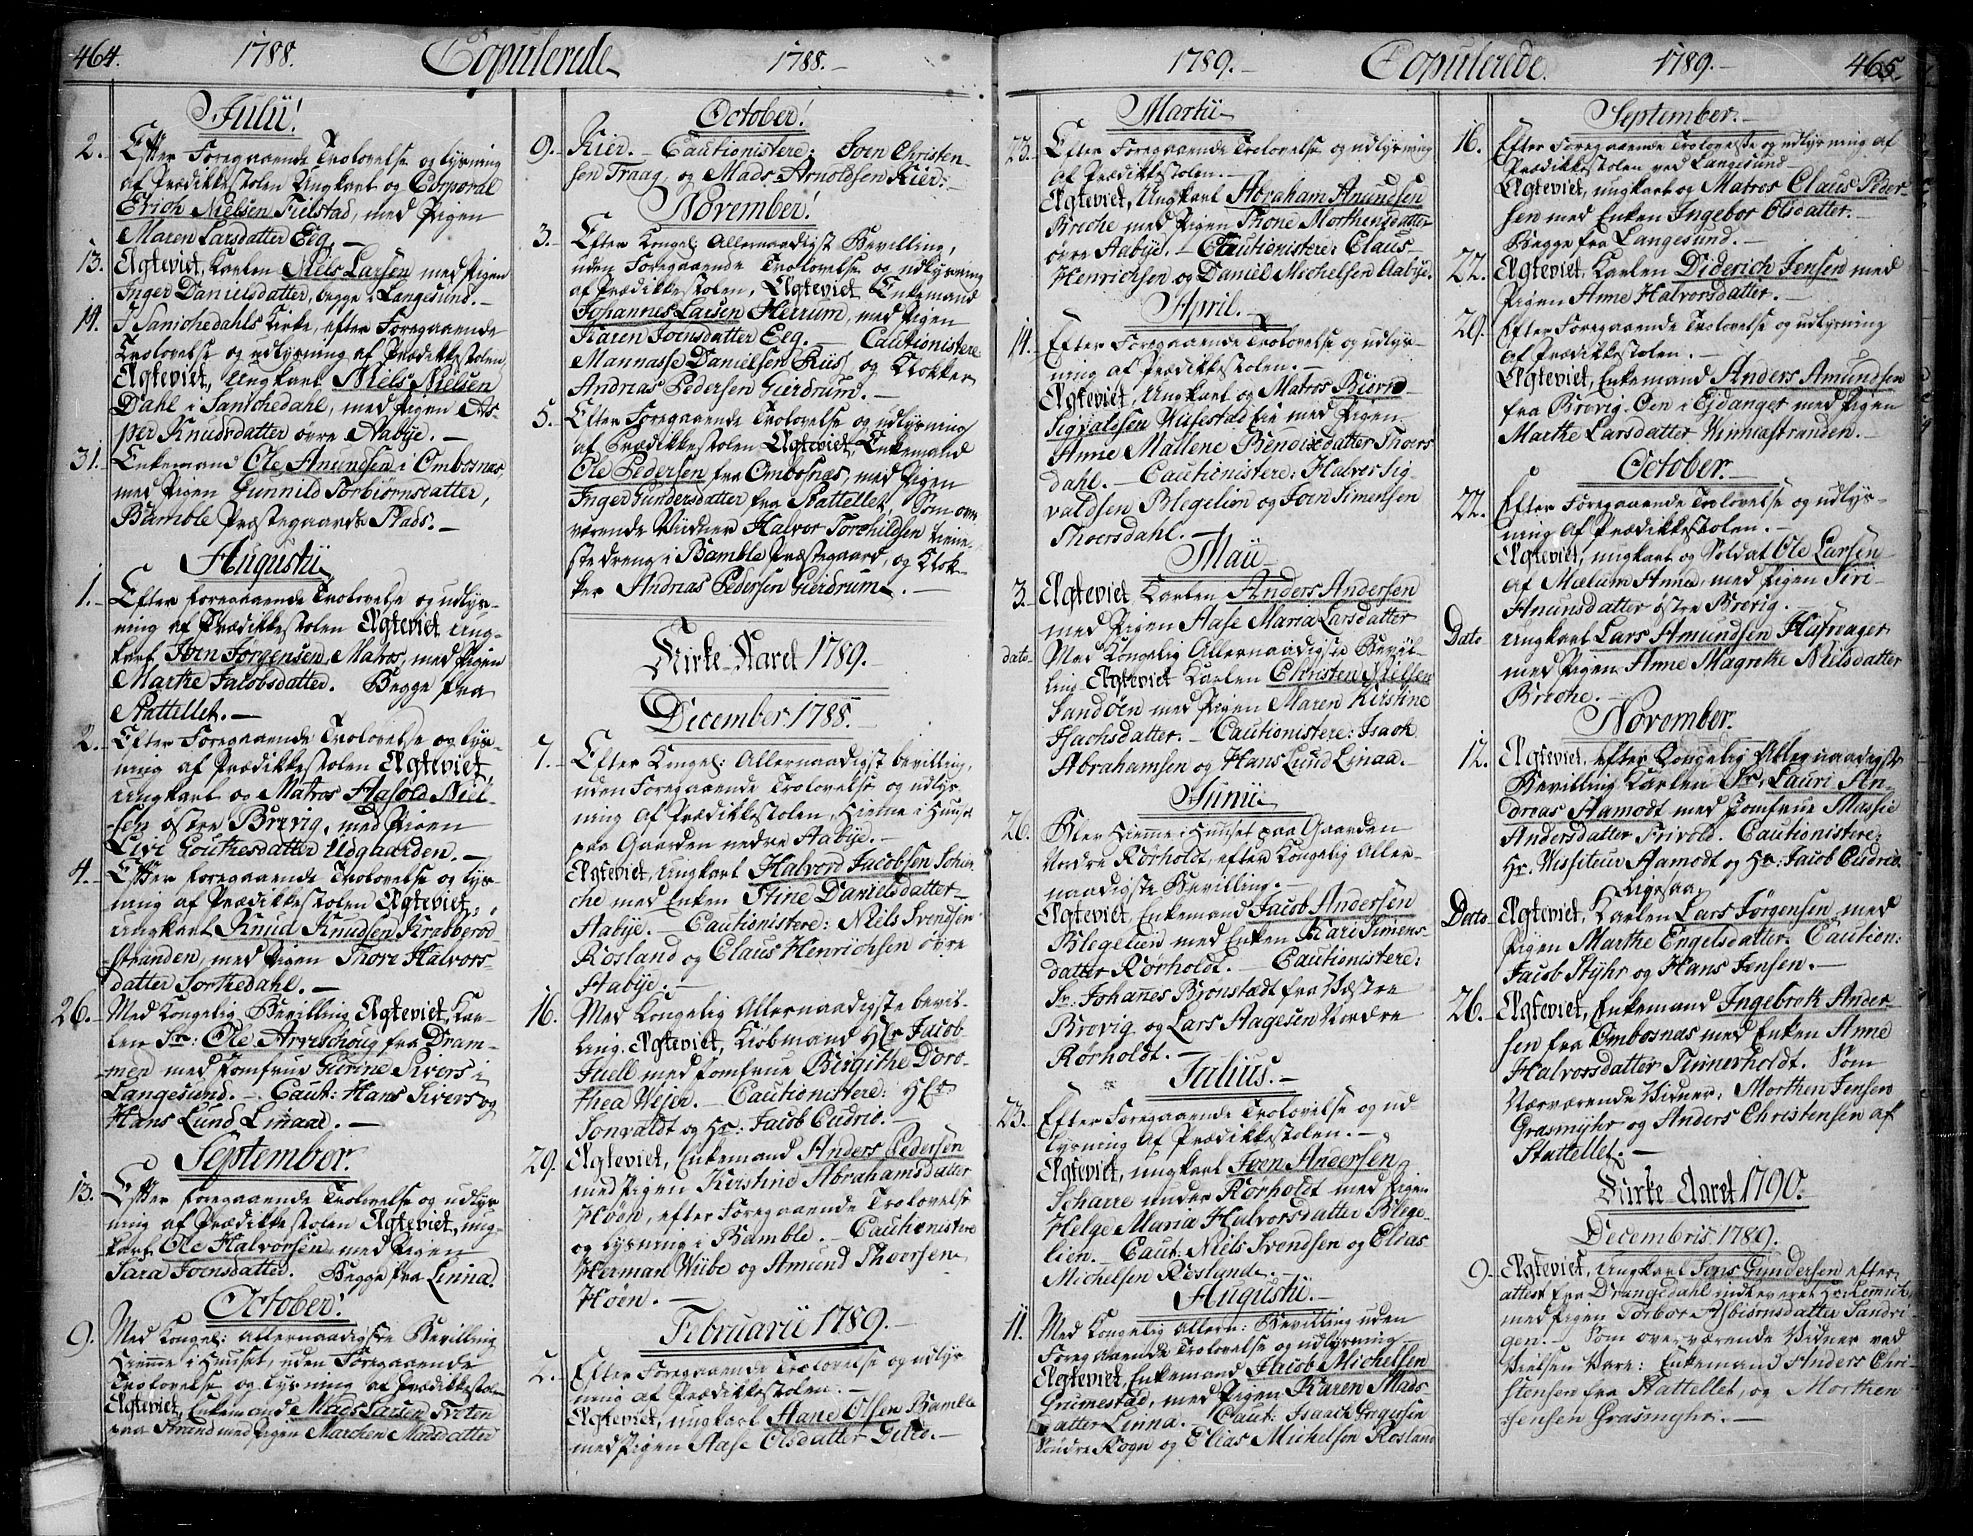 SAKO, Bamble kirkebøker, F/Fa/L0002: Ministerialbok nr. I 2, 1775-1814, s. 464-465